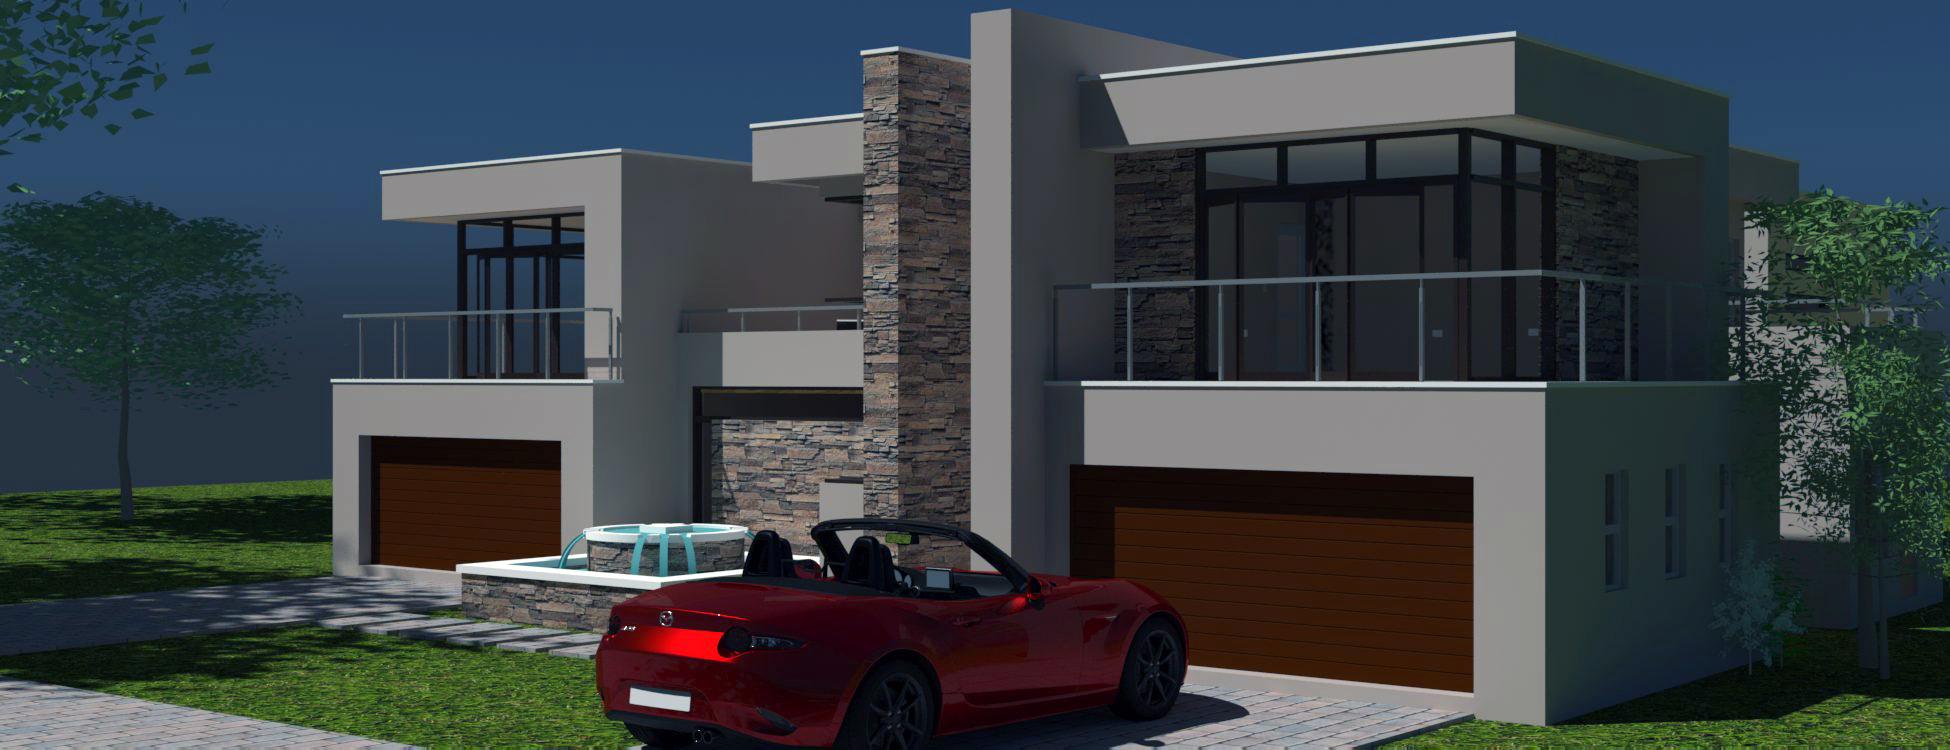 4 Bedroom House Plan Modern Double Story Floor Plan Nethouseplans